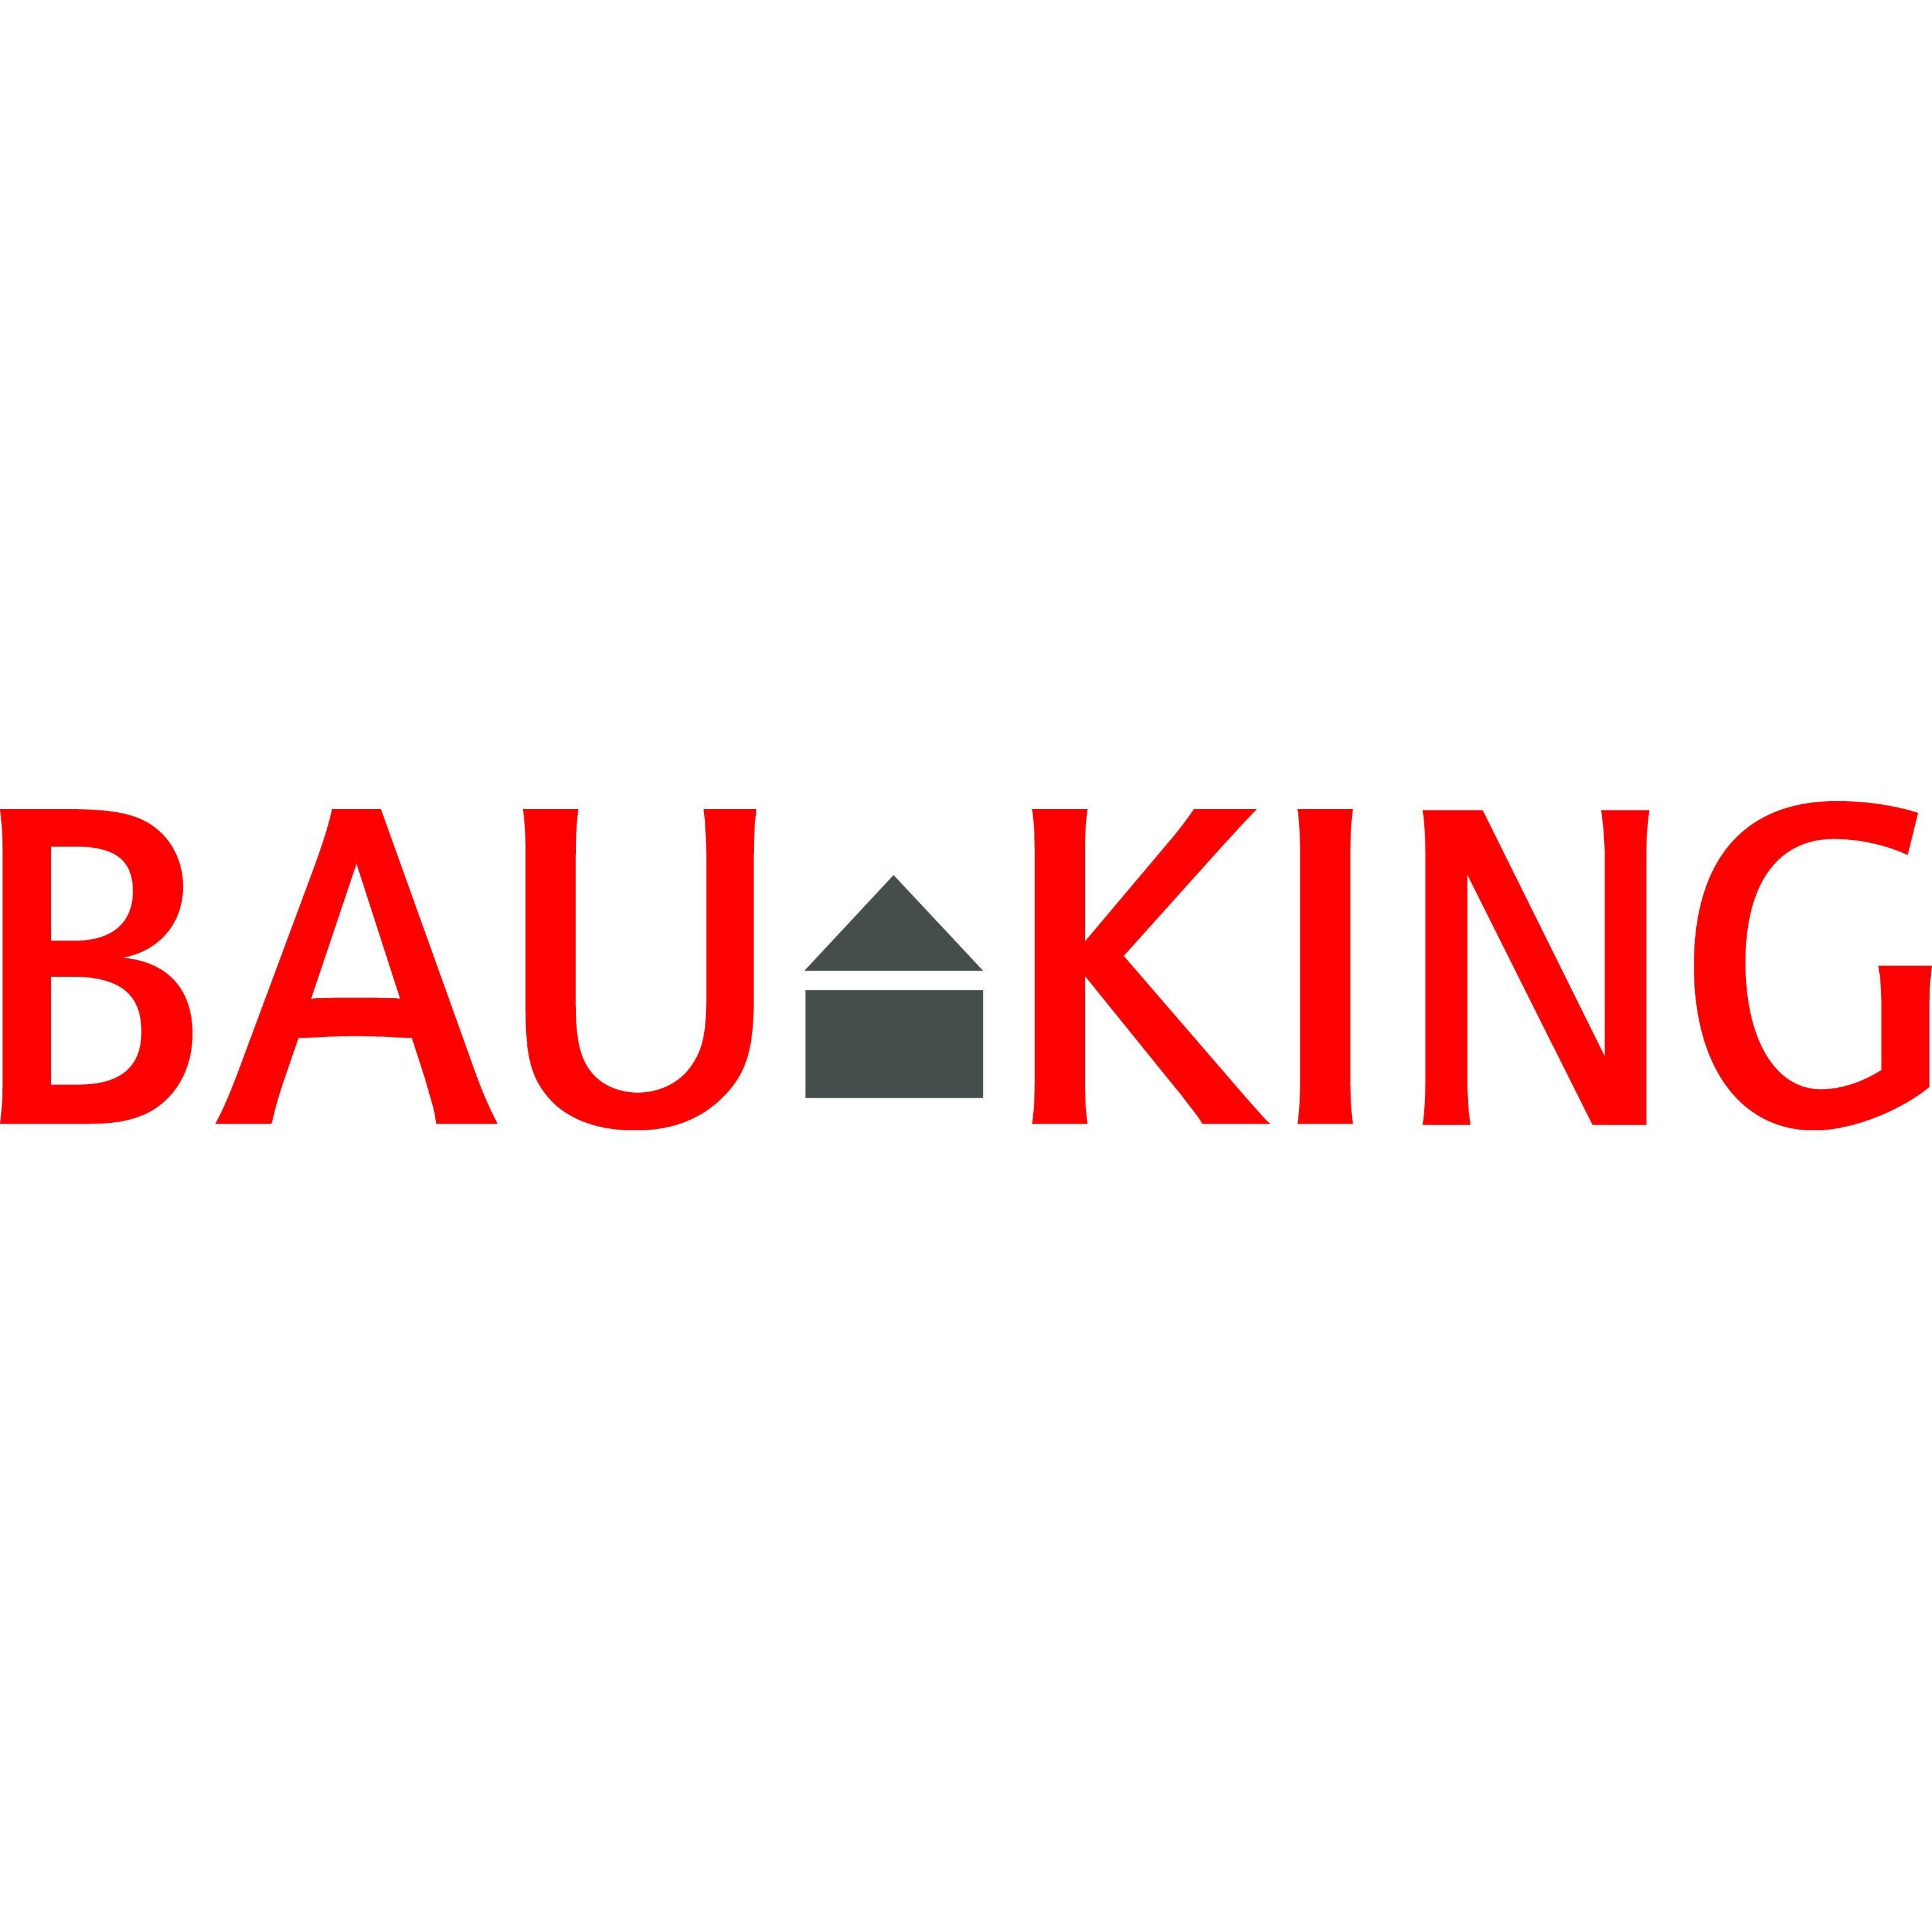 bauhaus berlin kurf rstendamm raico objektiv berliner baustellen 0356 baustelle fertig bauhaus. Black Bedroom Furniture Sets. Home Design Ideas